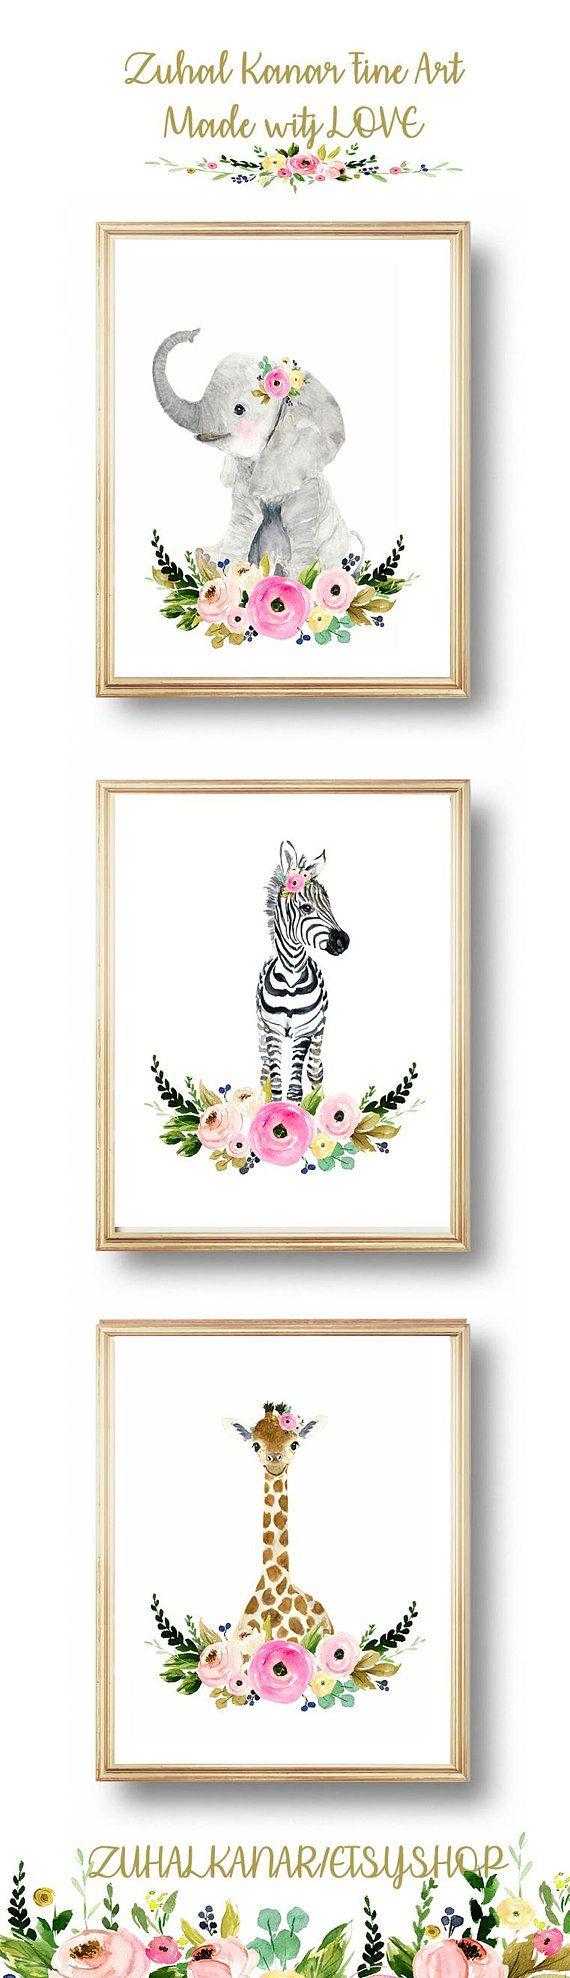 Safari Babys Kinderzimmer Set, Tiermalereien, Elefant, Giraffe, Zebra, Aquarell Tier, Kinder Poster, Baby Mädchen Kinderzimmer Kunst, Kinderzimmer Kunst – Nursery art, Woodland nursery